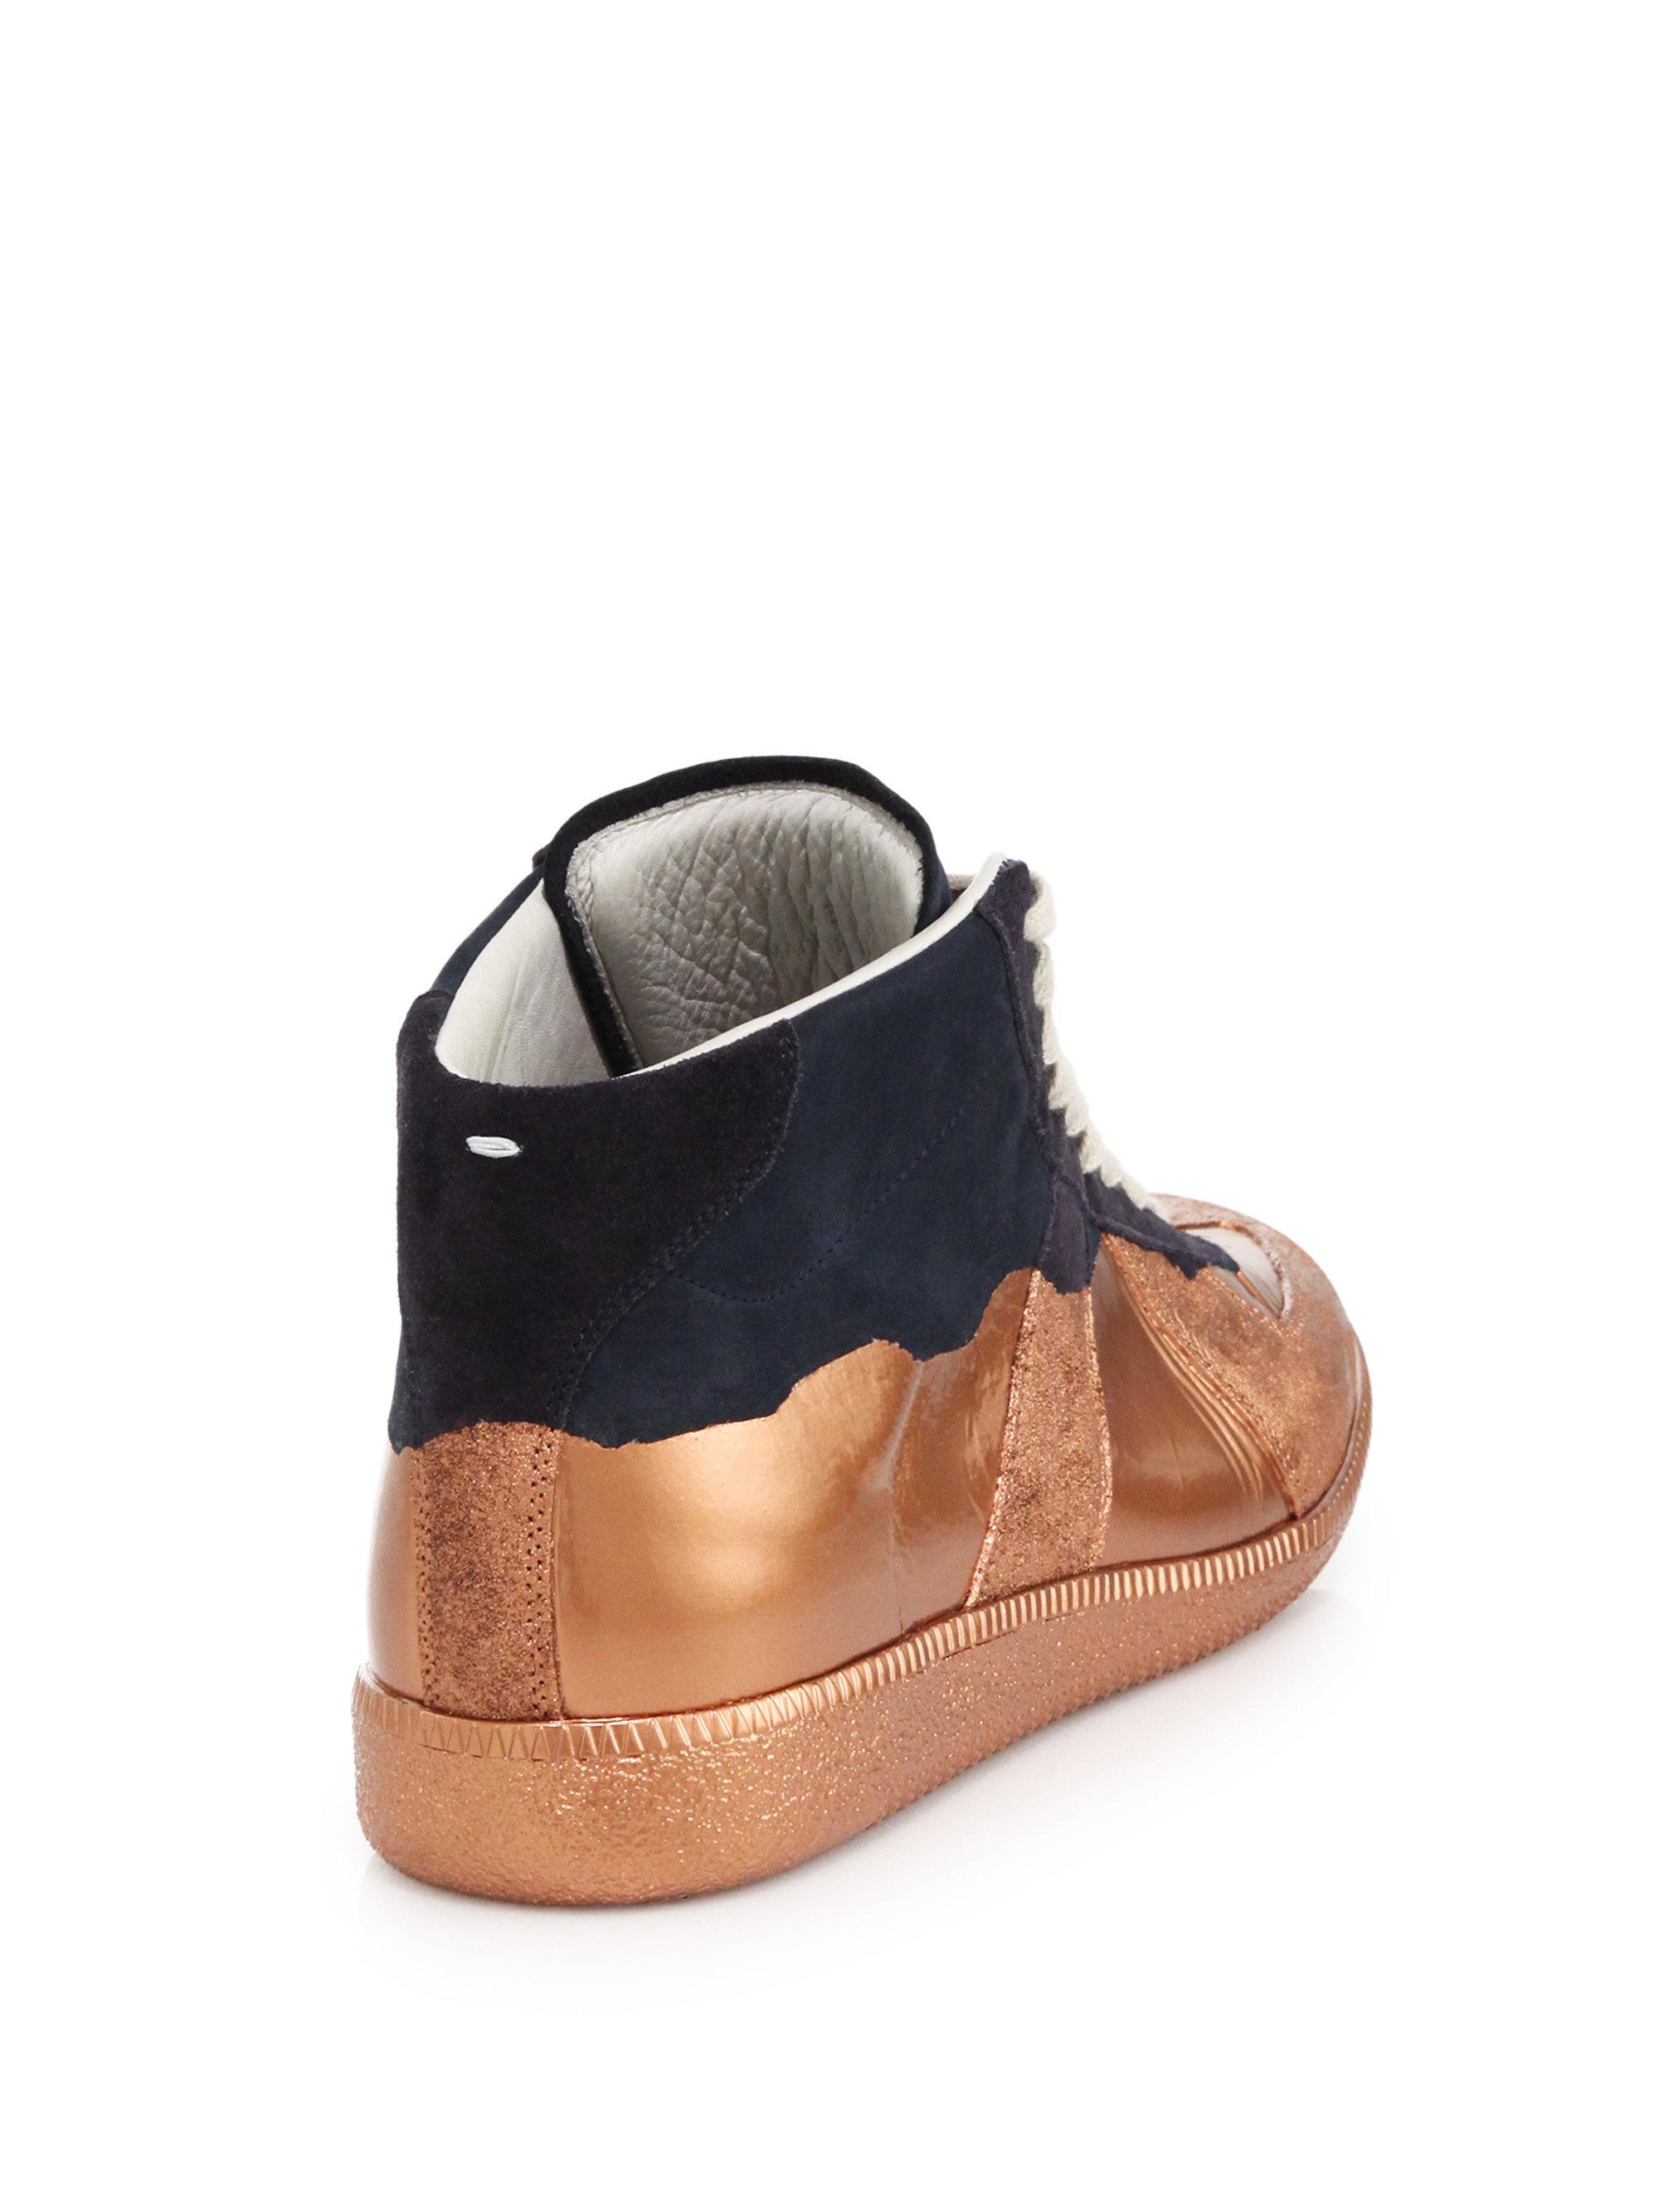 Lyst Maison Margiela Replica Multicolored Leather High top Sneaker